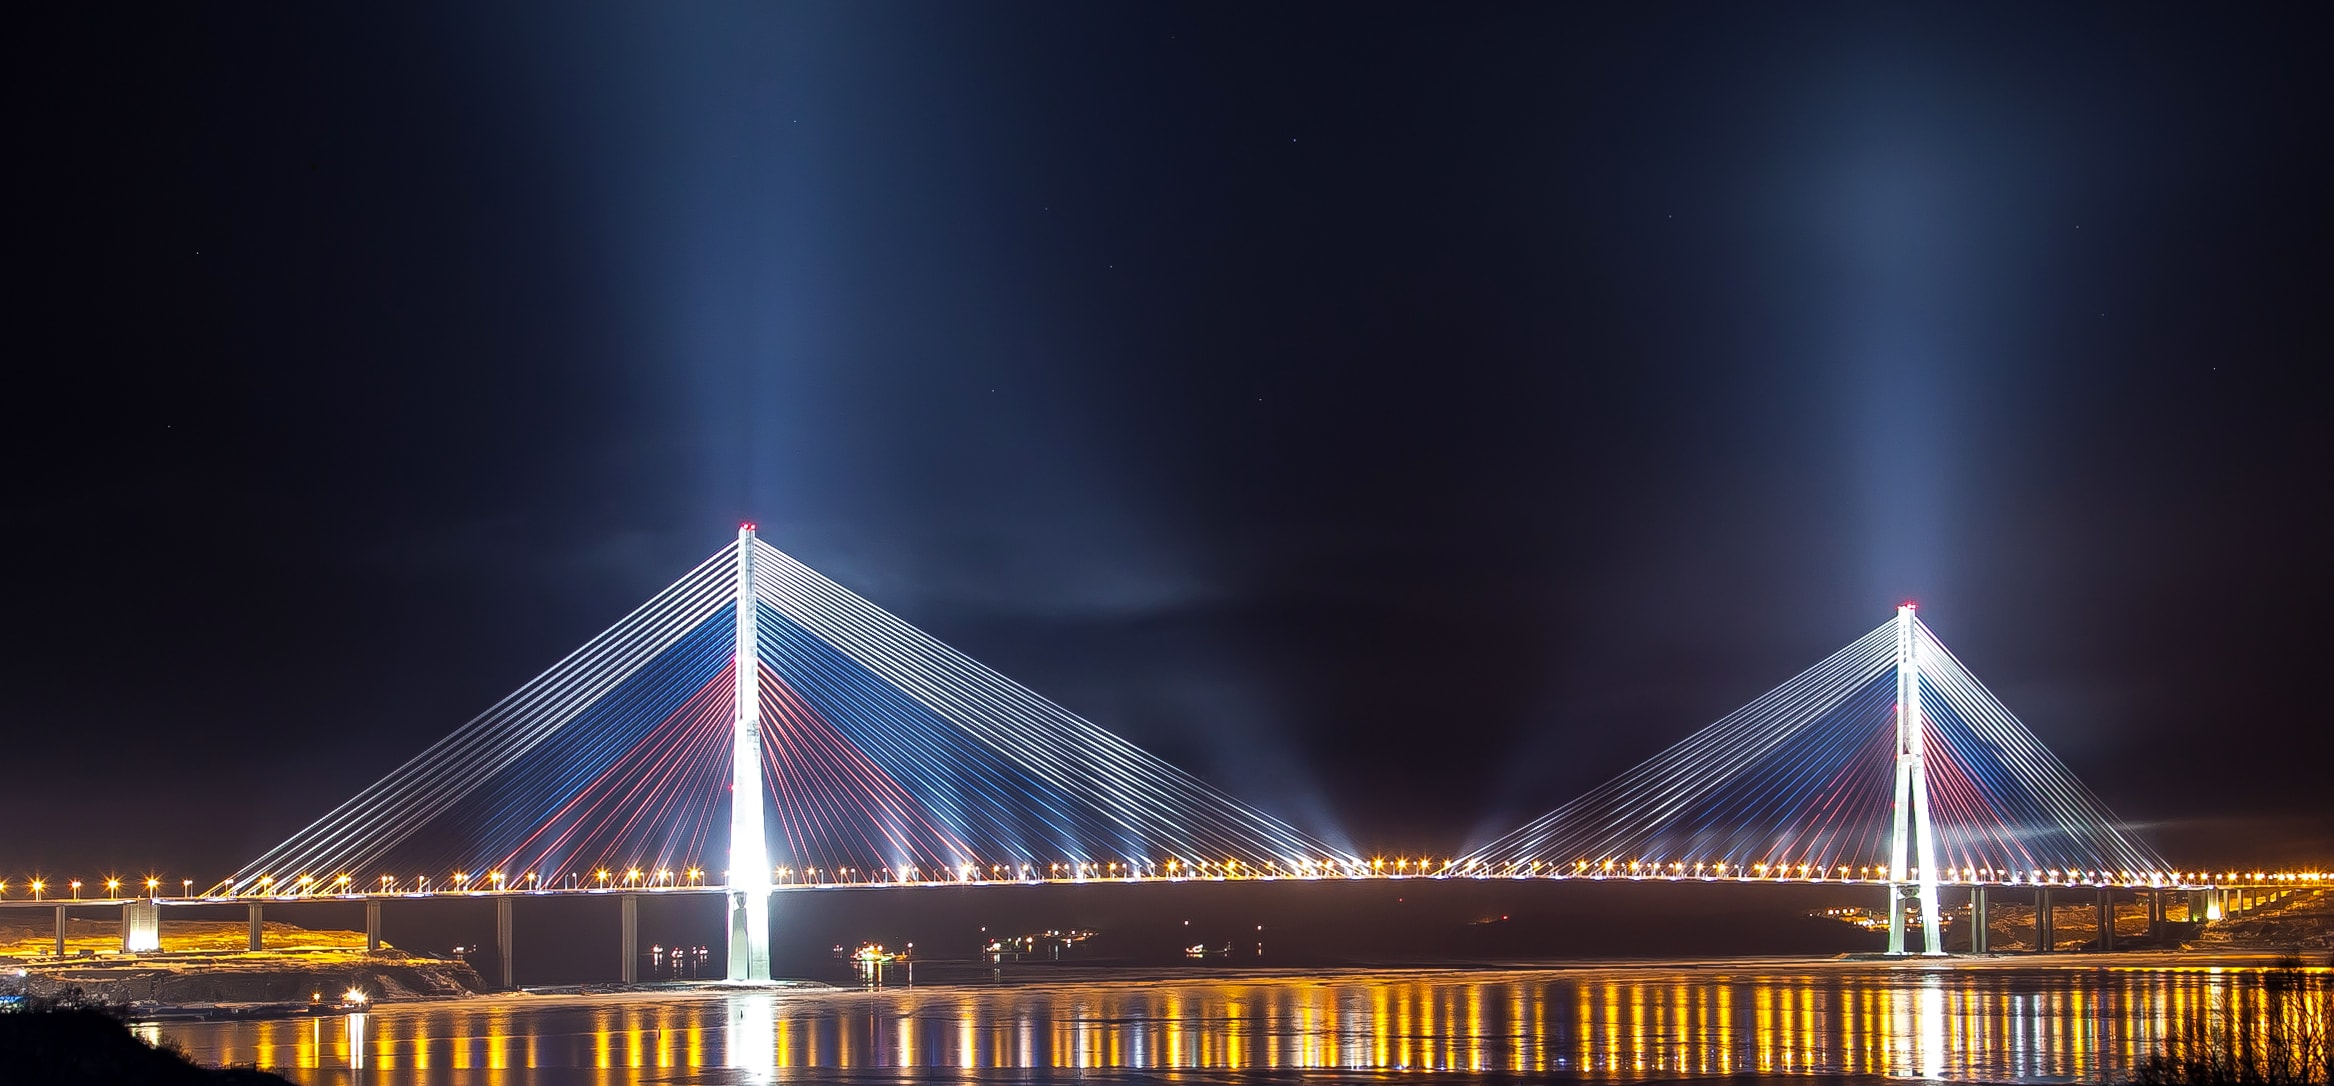 Russki-Brücke bei Nacht Bild: Баяков Алексей Александрович CC BY-SA 3.0